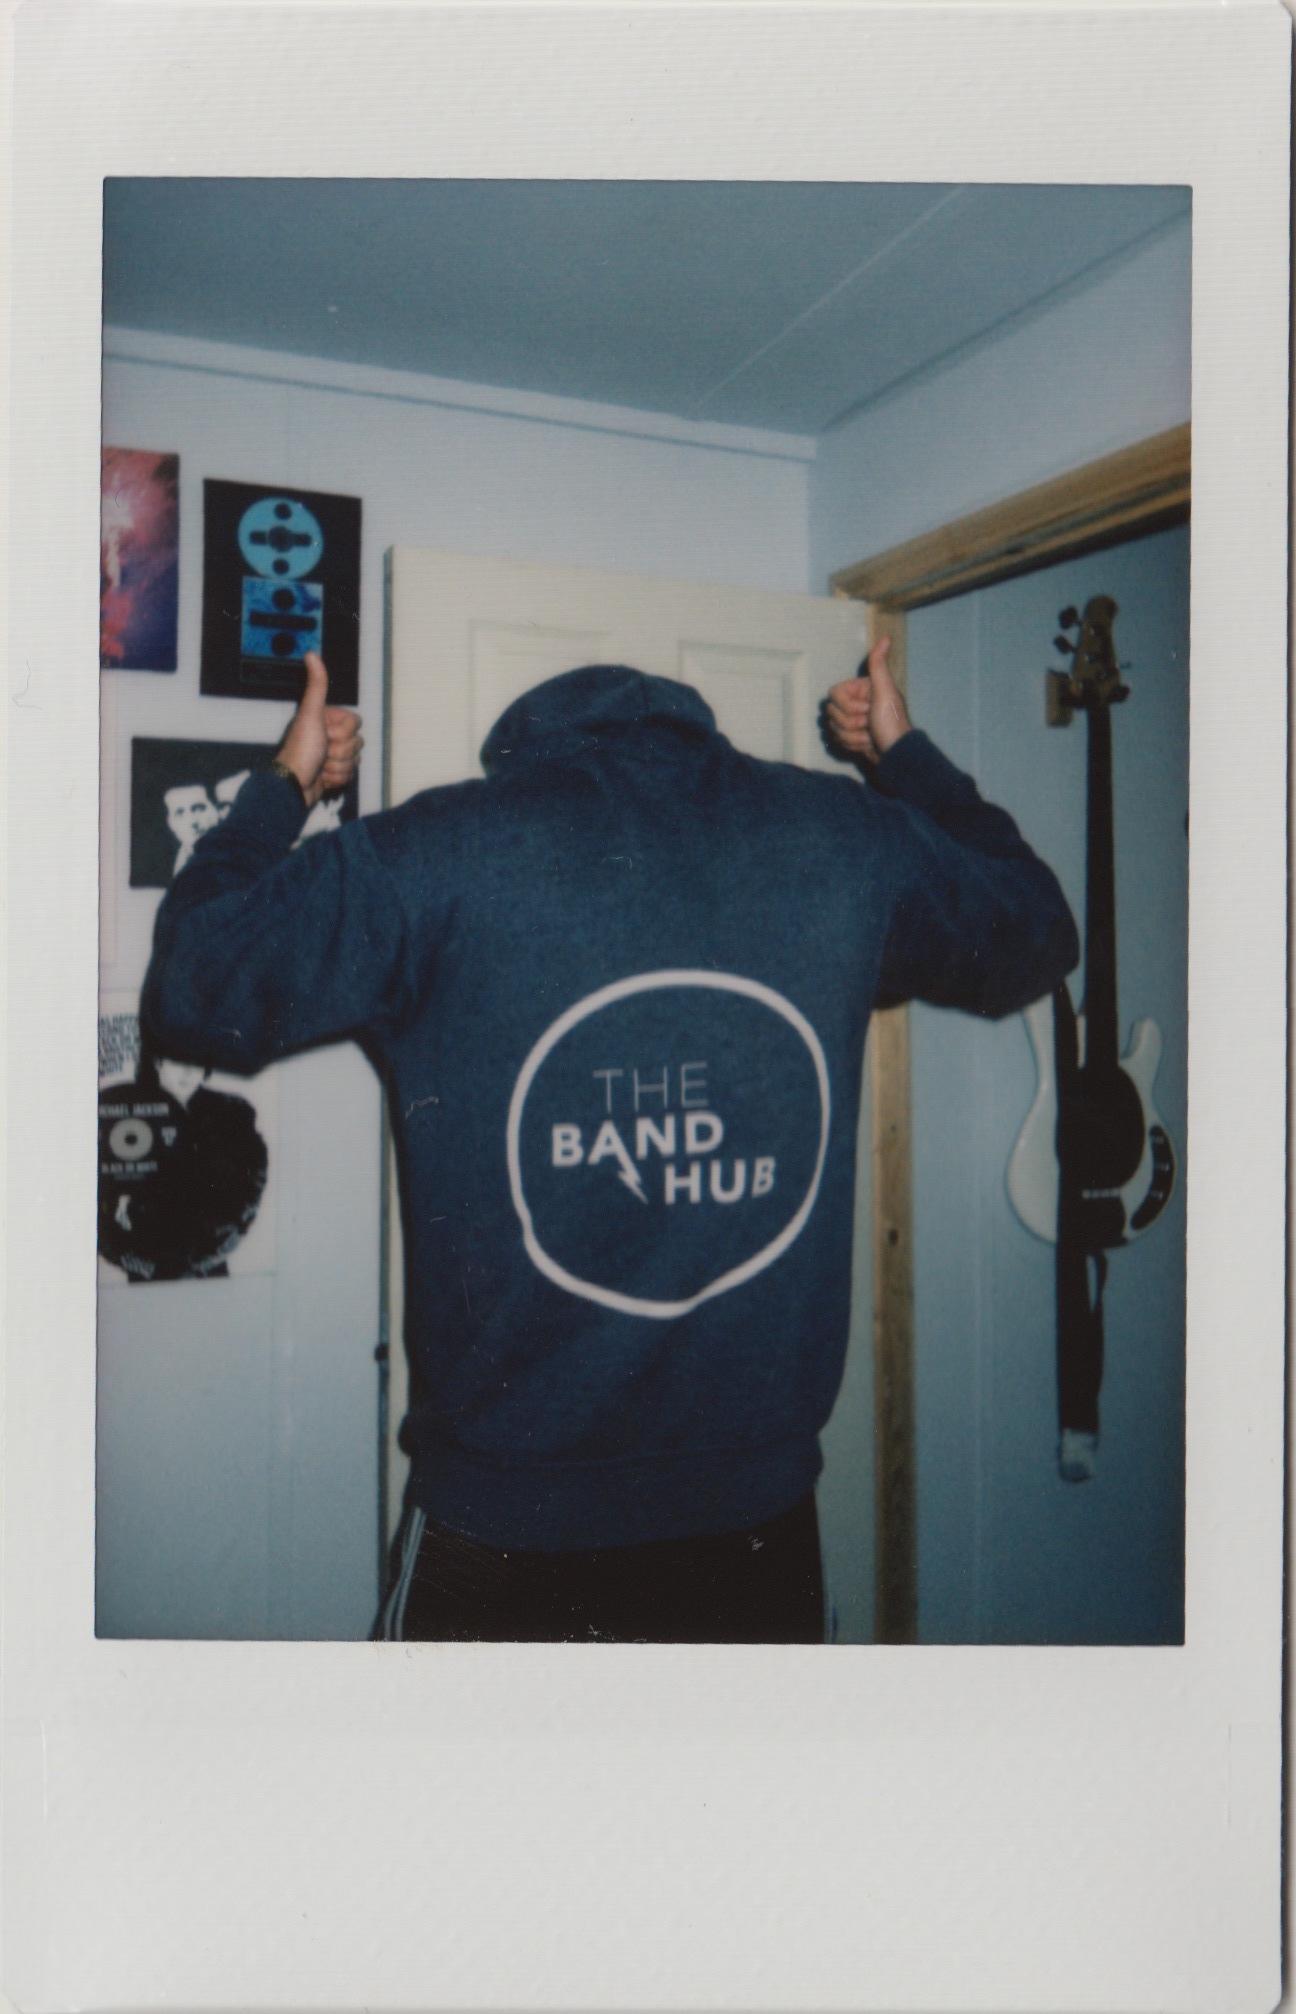 band hub 3.jpeg